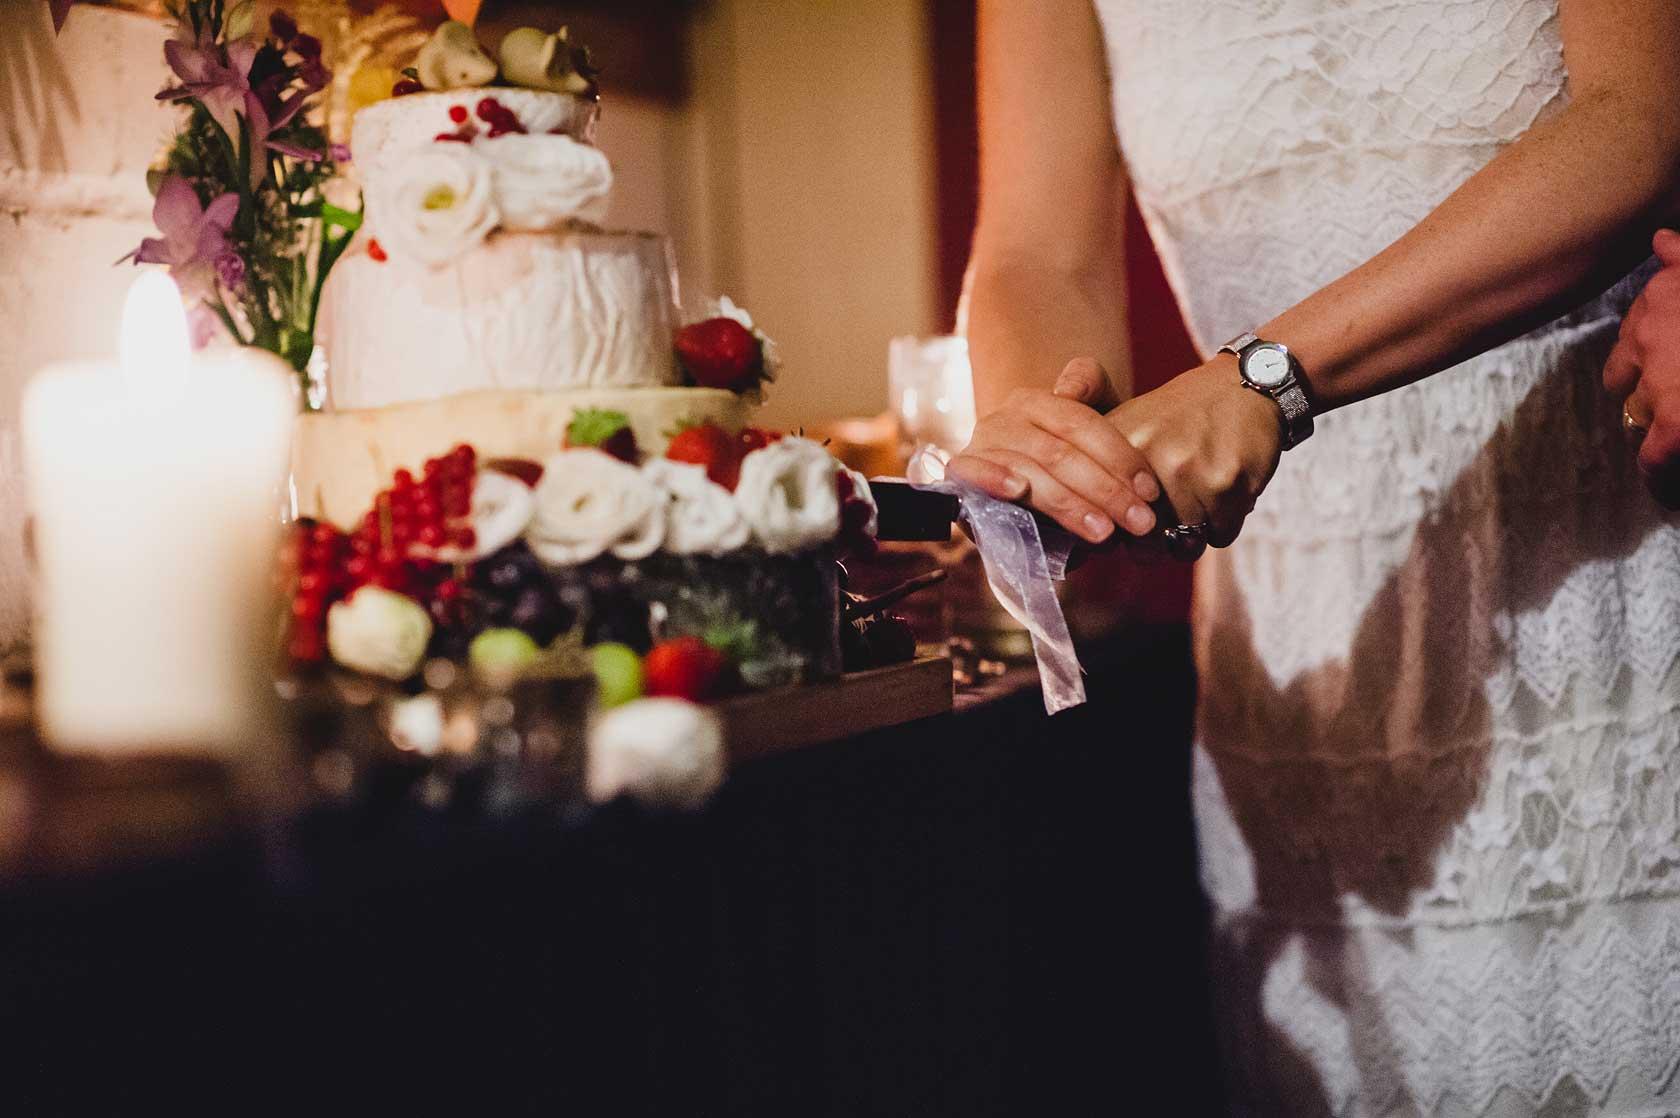 Wedding Photographer at Hackney City Farm